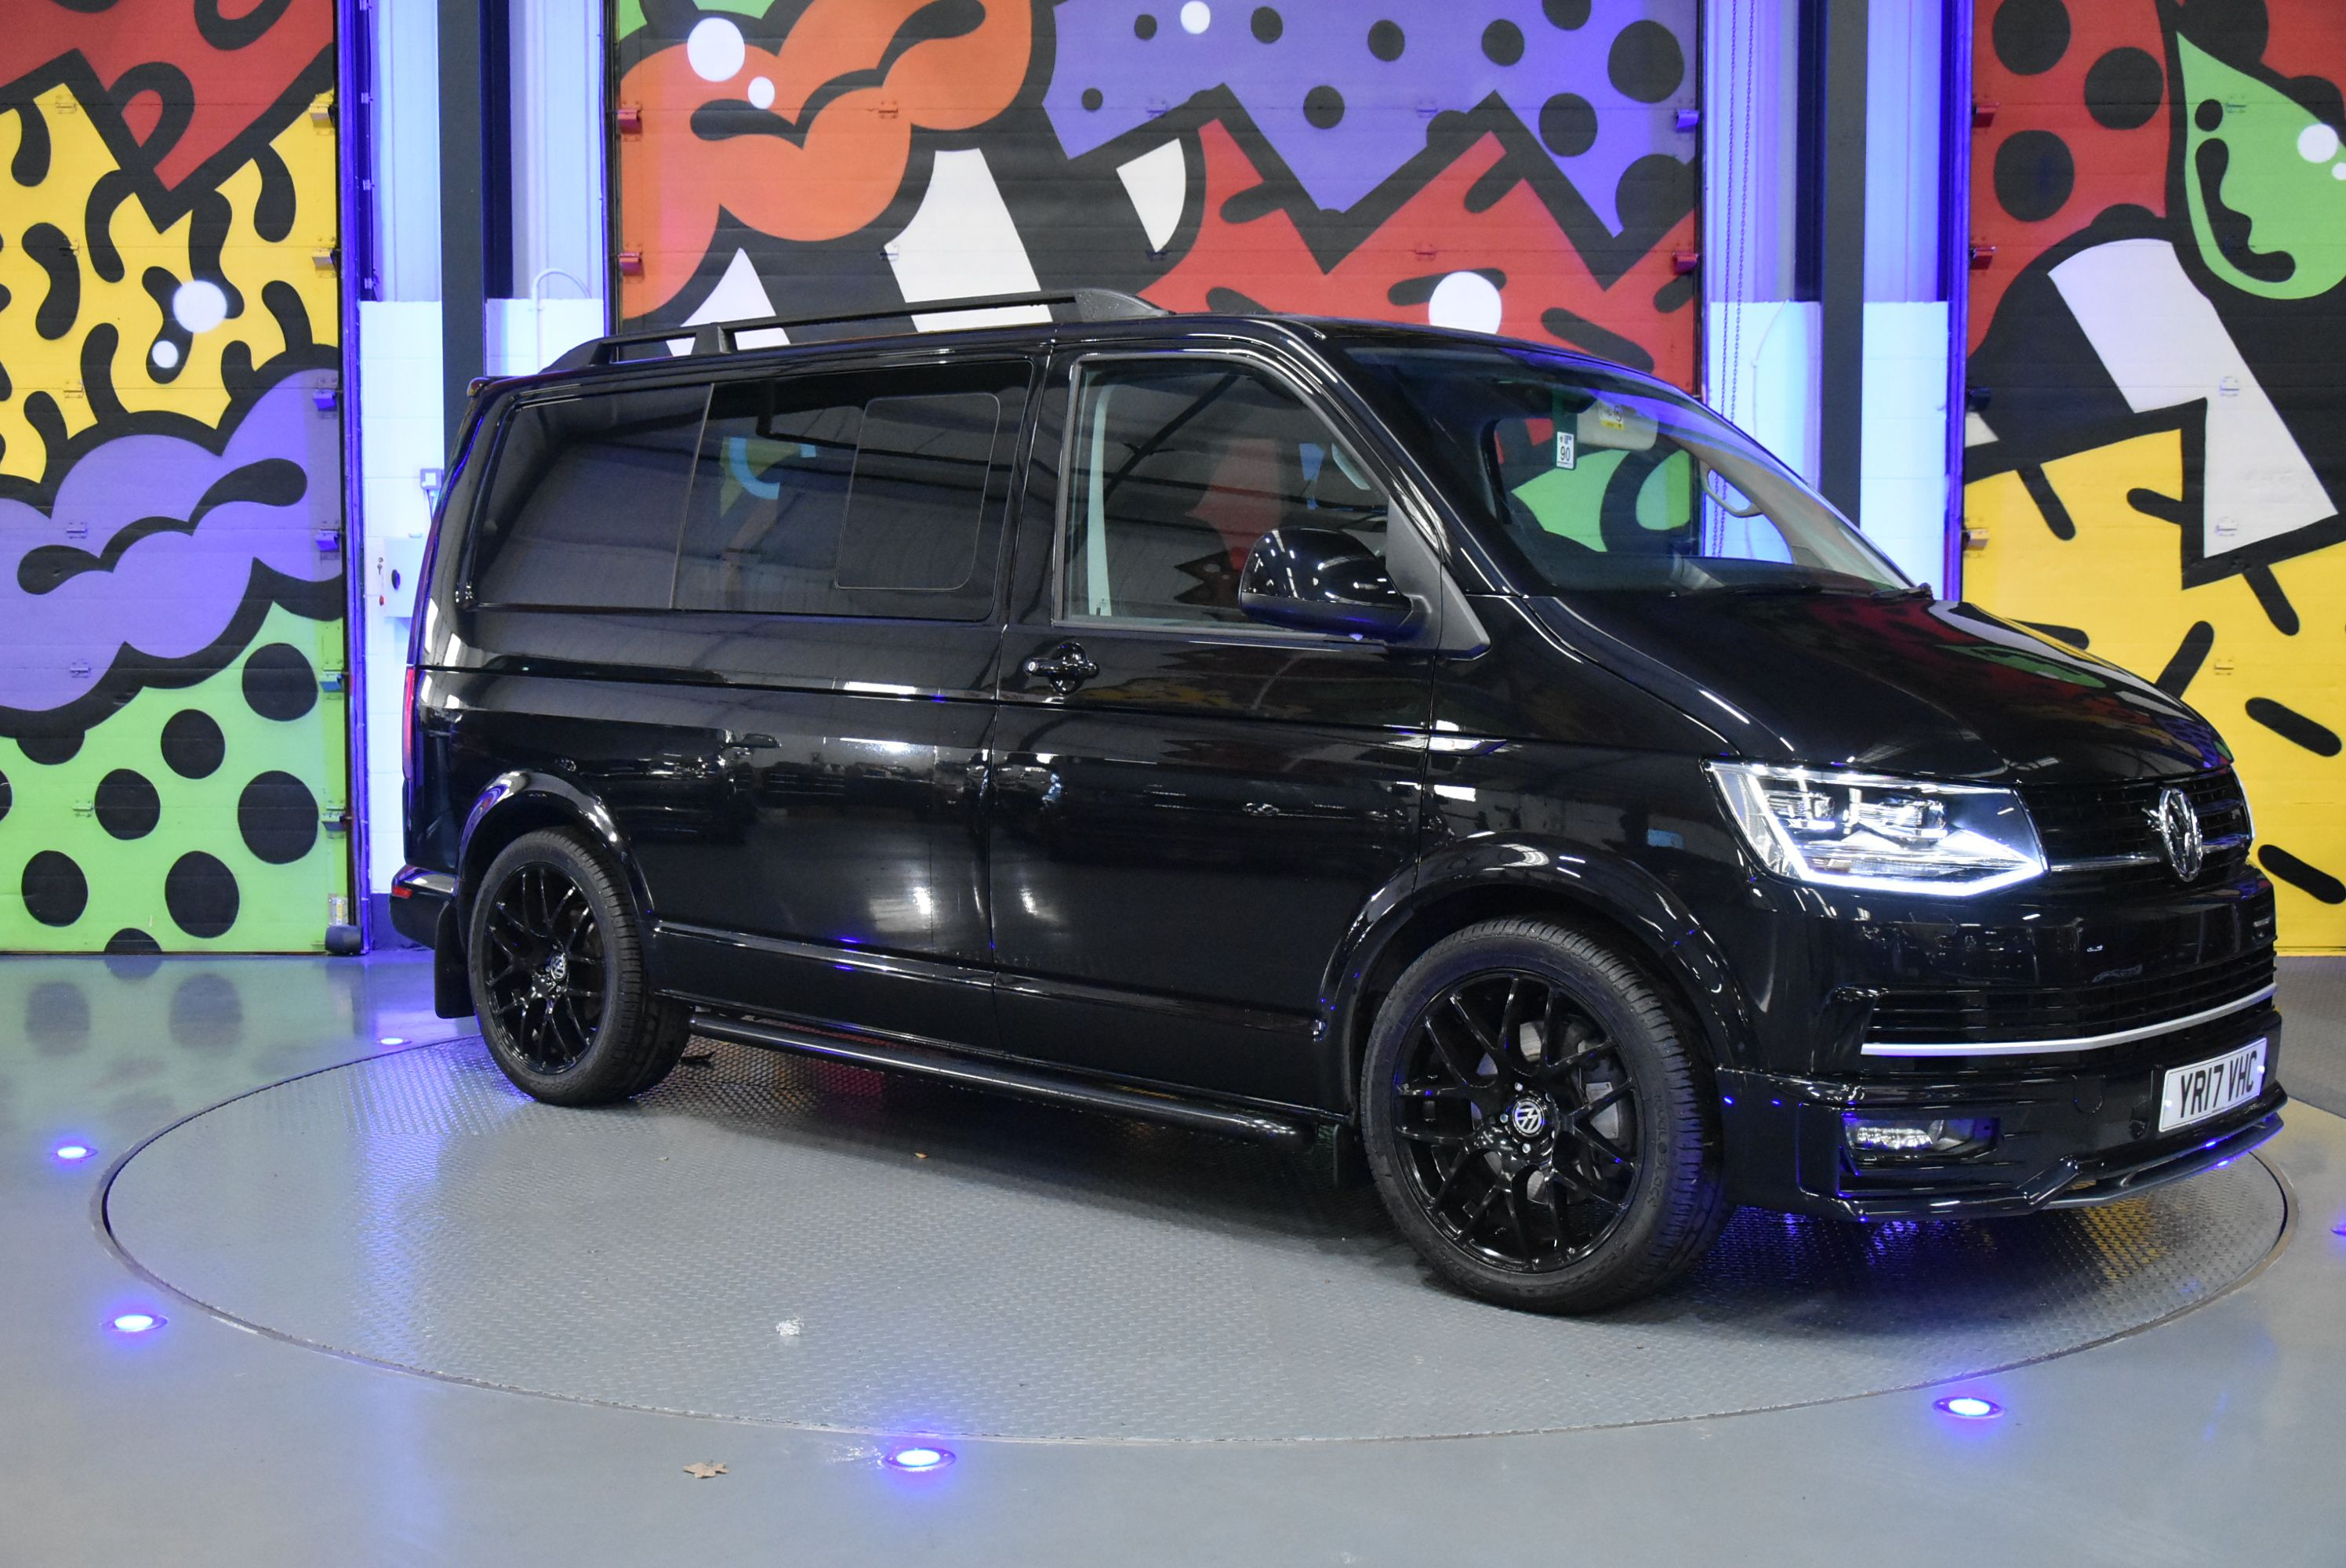 Deep Black Vw Transporter T6 Swb 150ps Dsg Highline Kombi Vw Transporter Volkswagen Bumper Protector